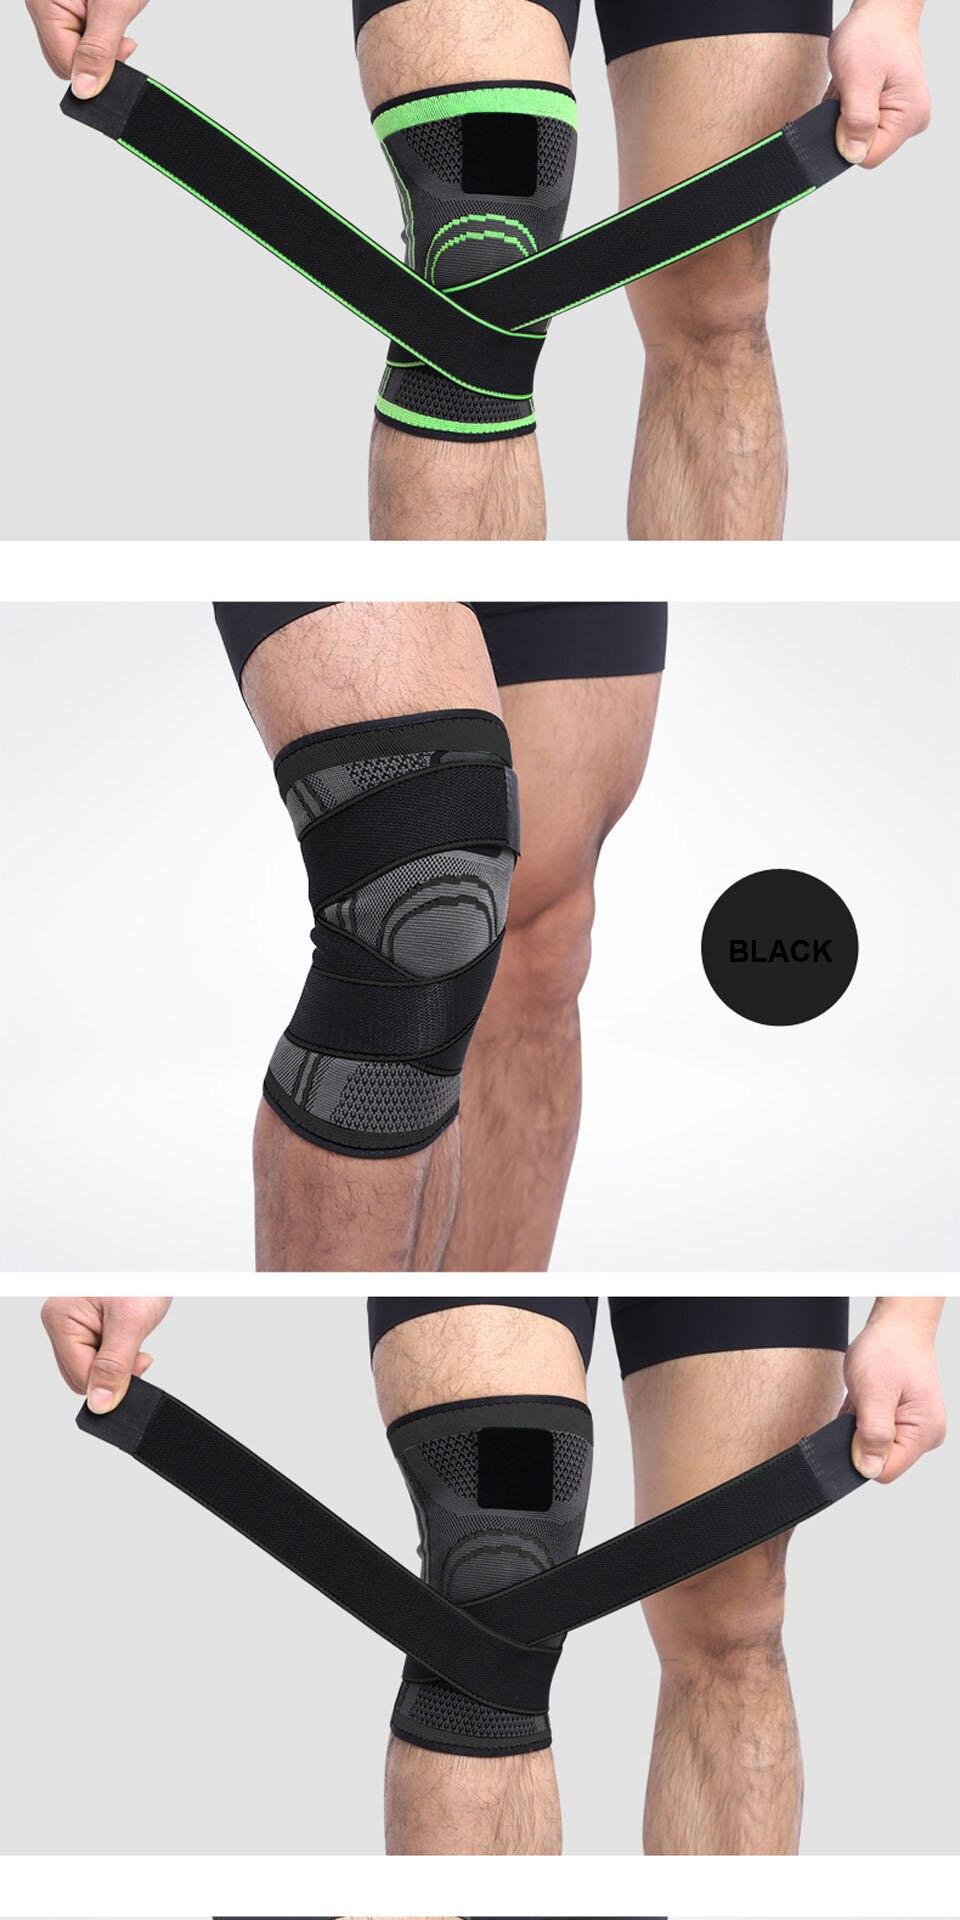 bd0fe17cf7 3D Sports Knee Pad Knee Brace Professional Protective Sports Knee ...